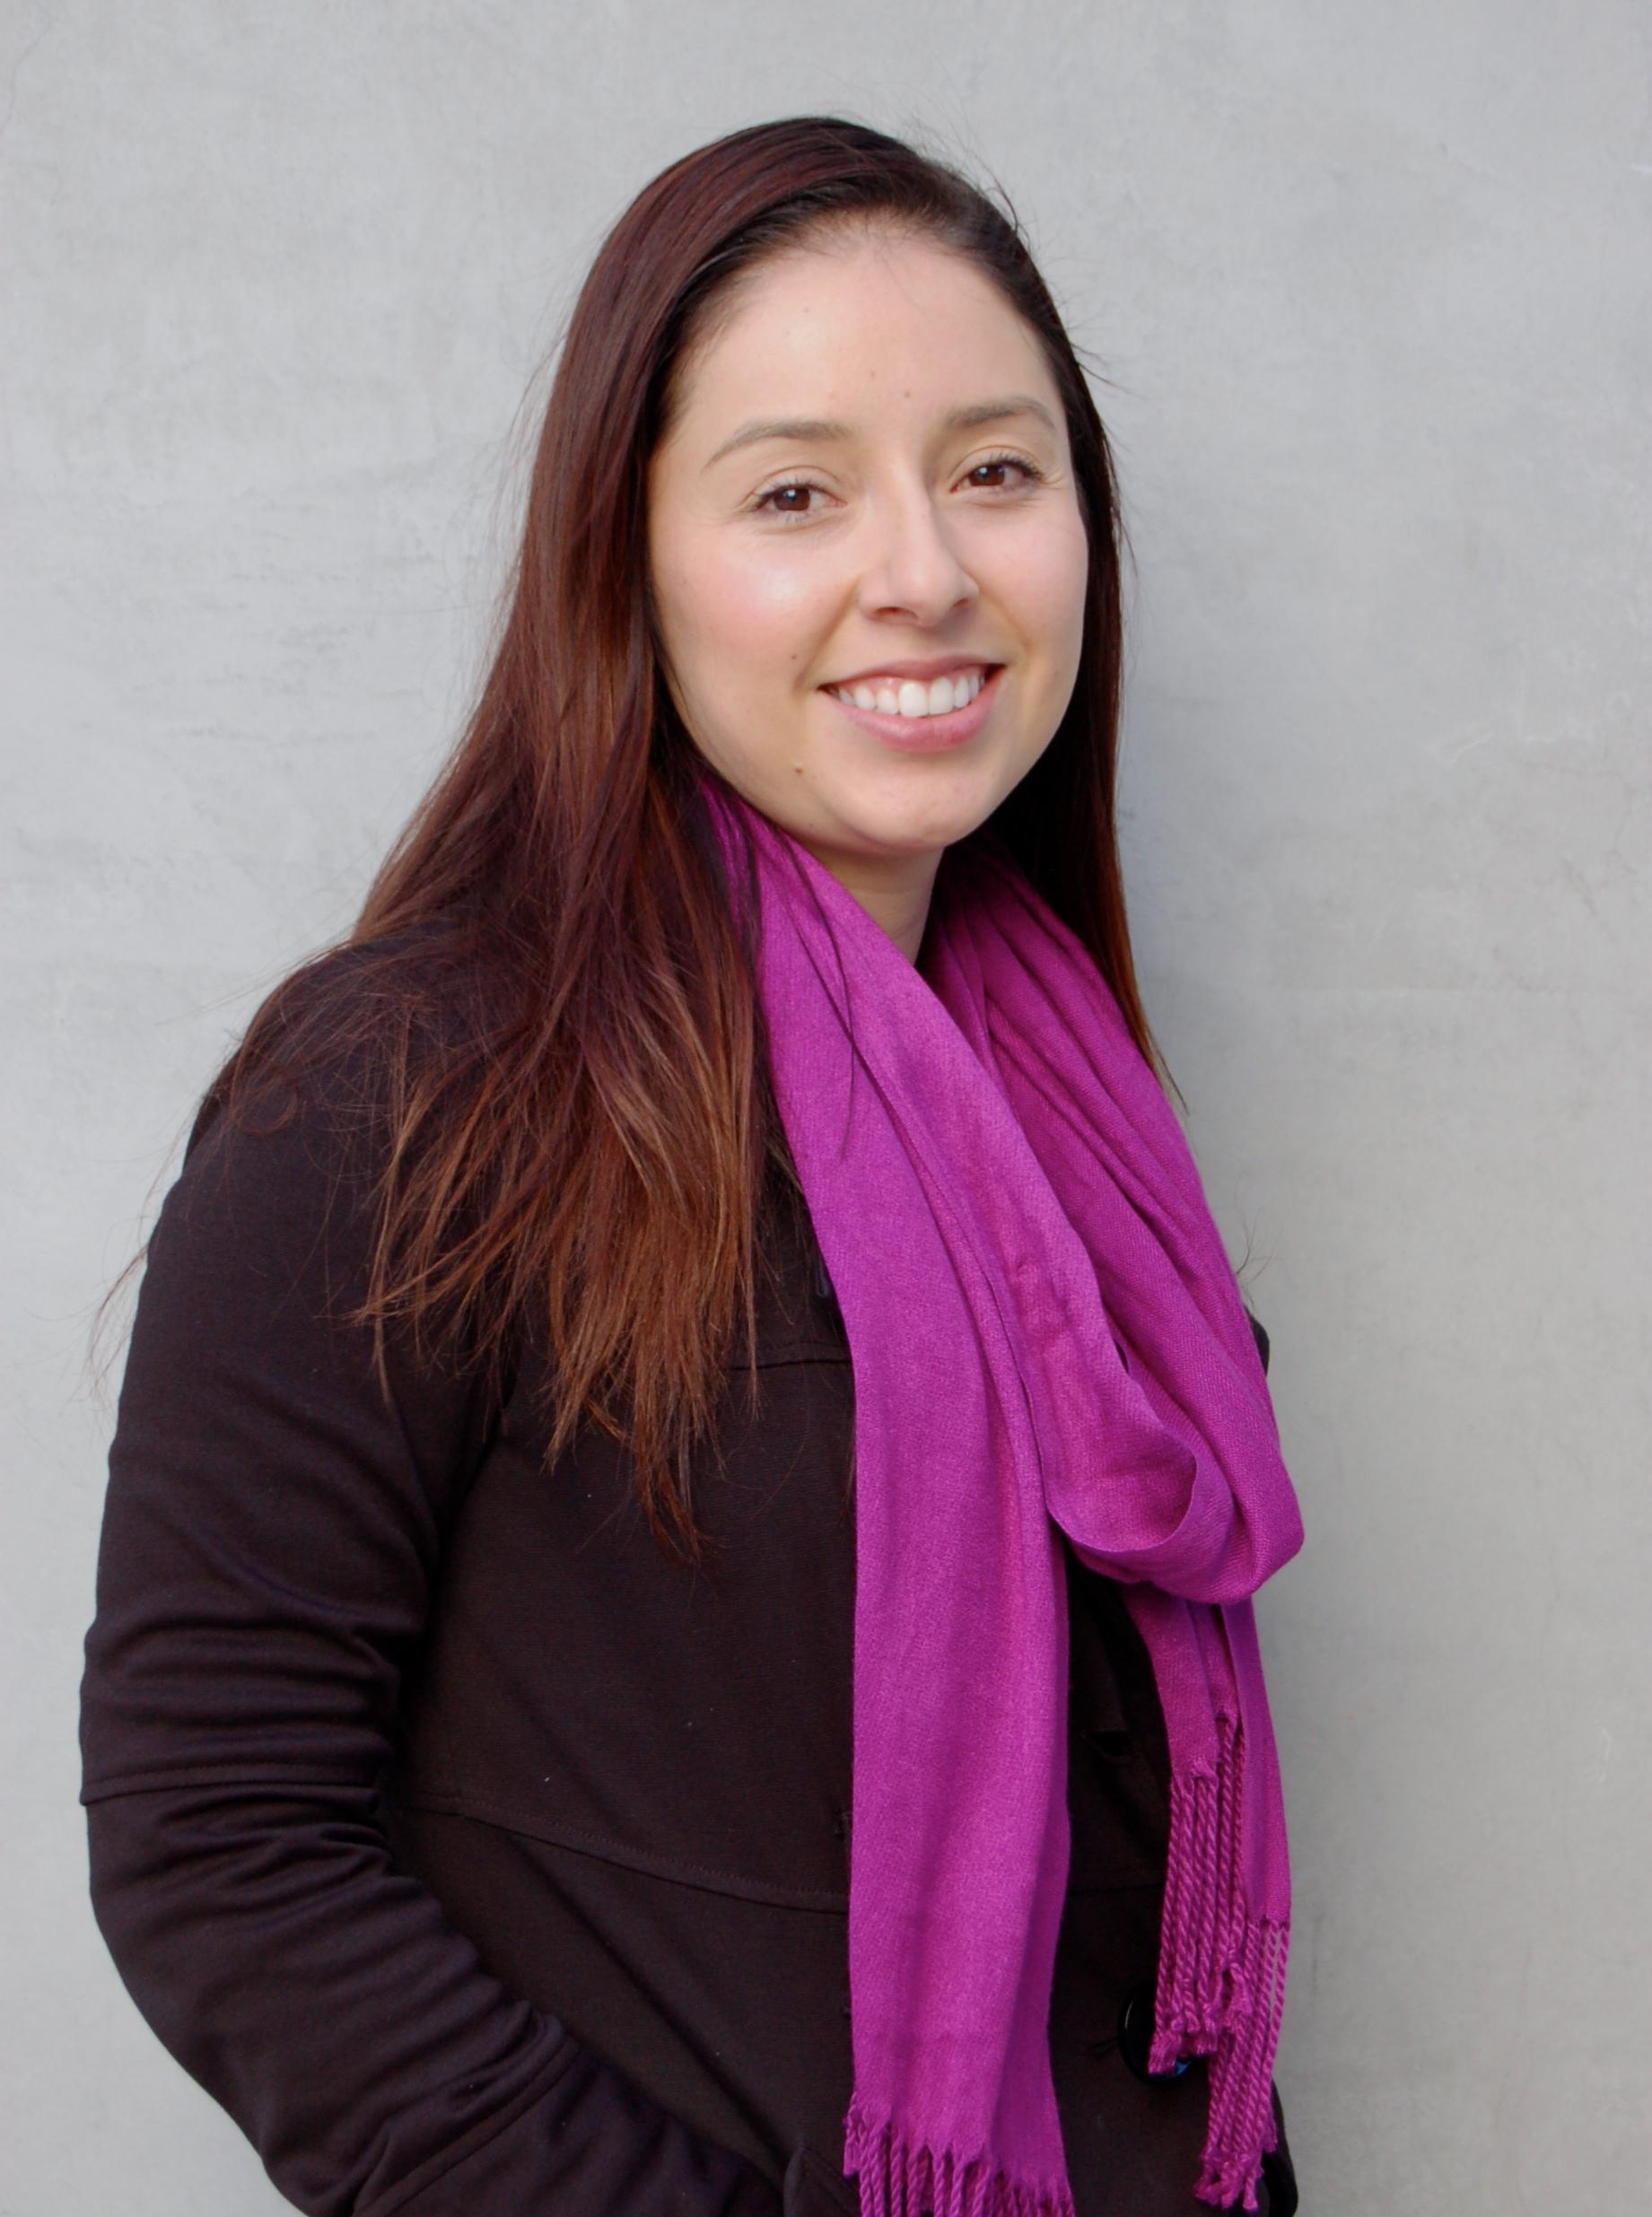 Adilene Quitana